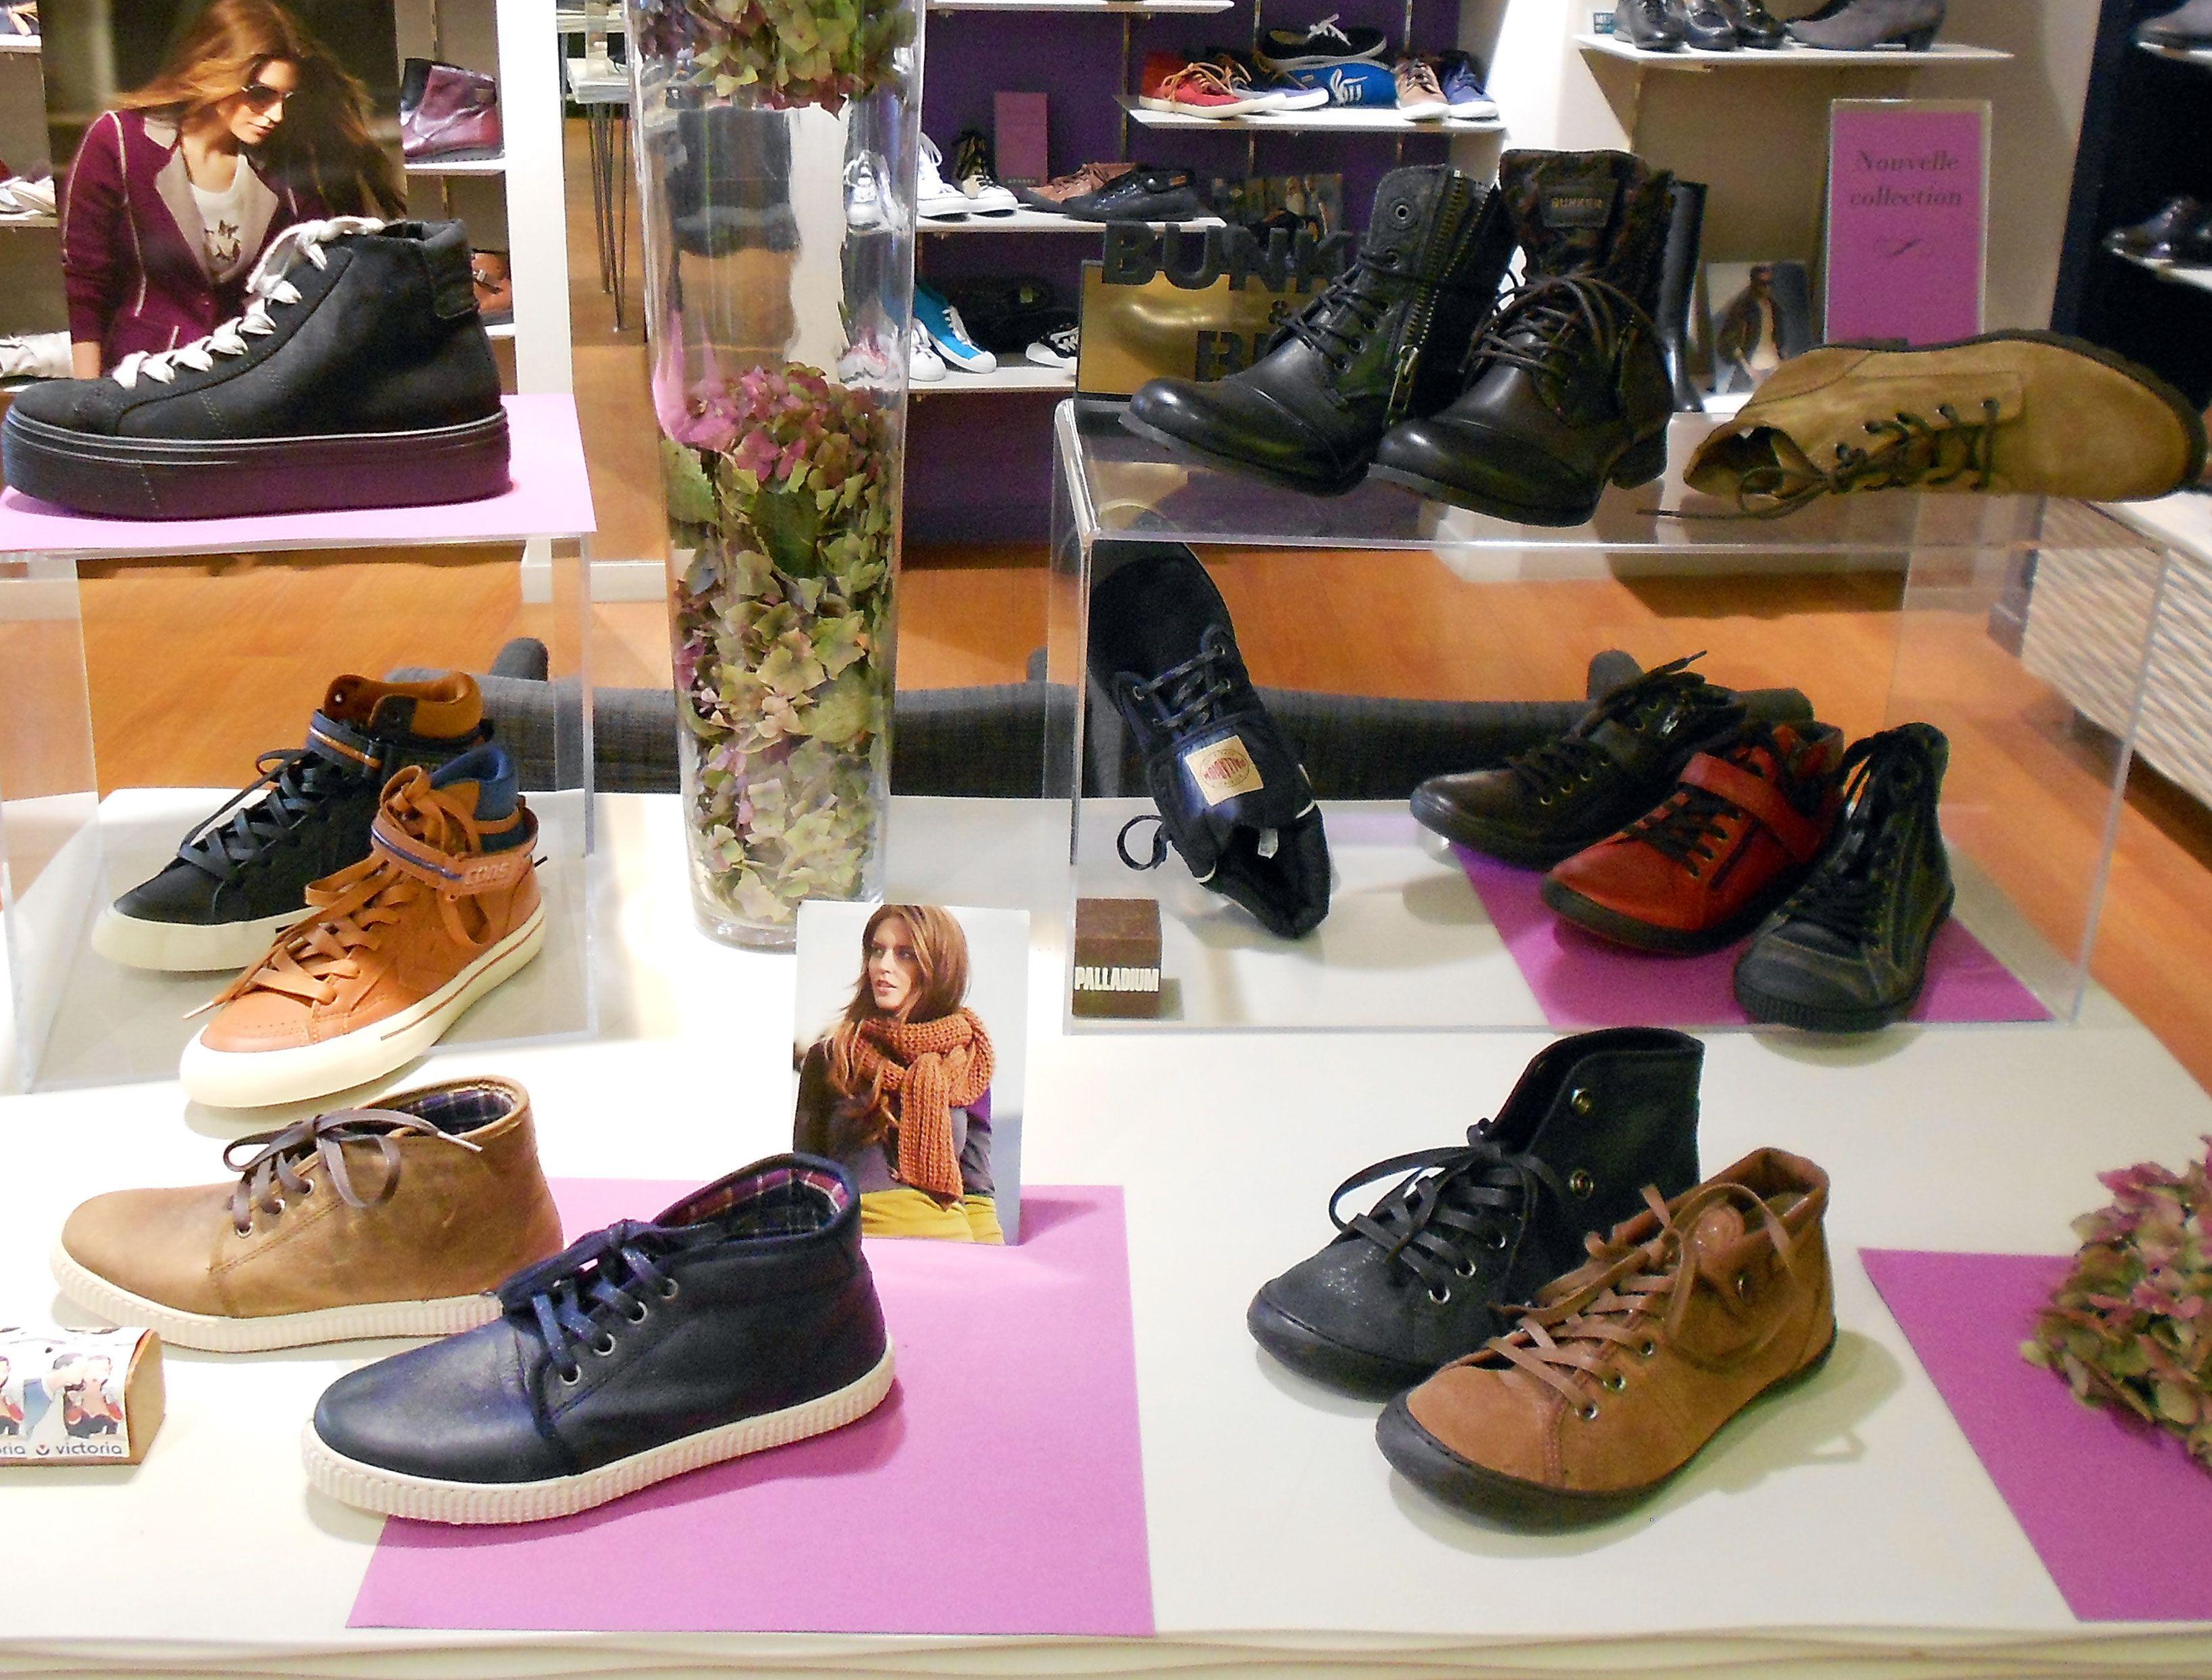 Chaussures femme : toute la collection Bessec Chaussures